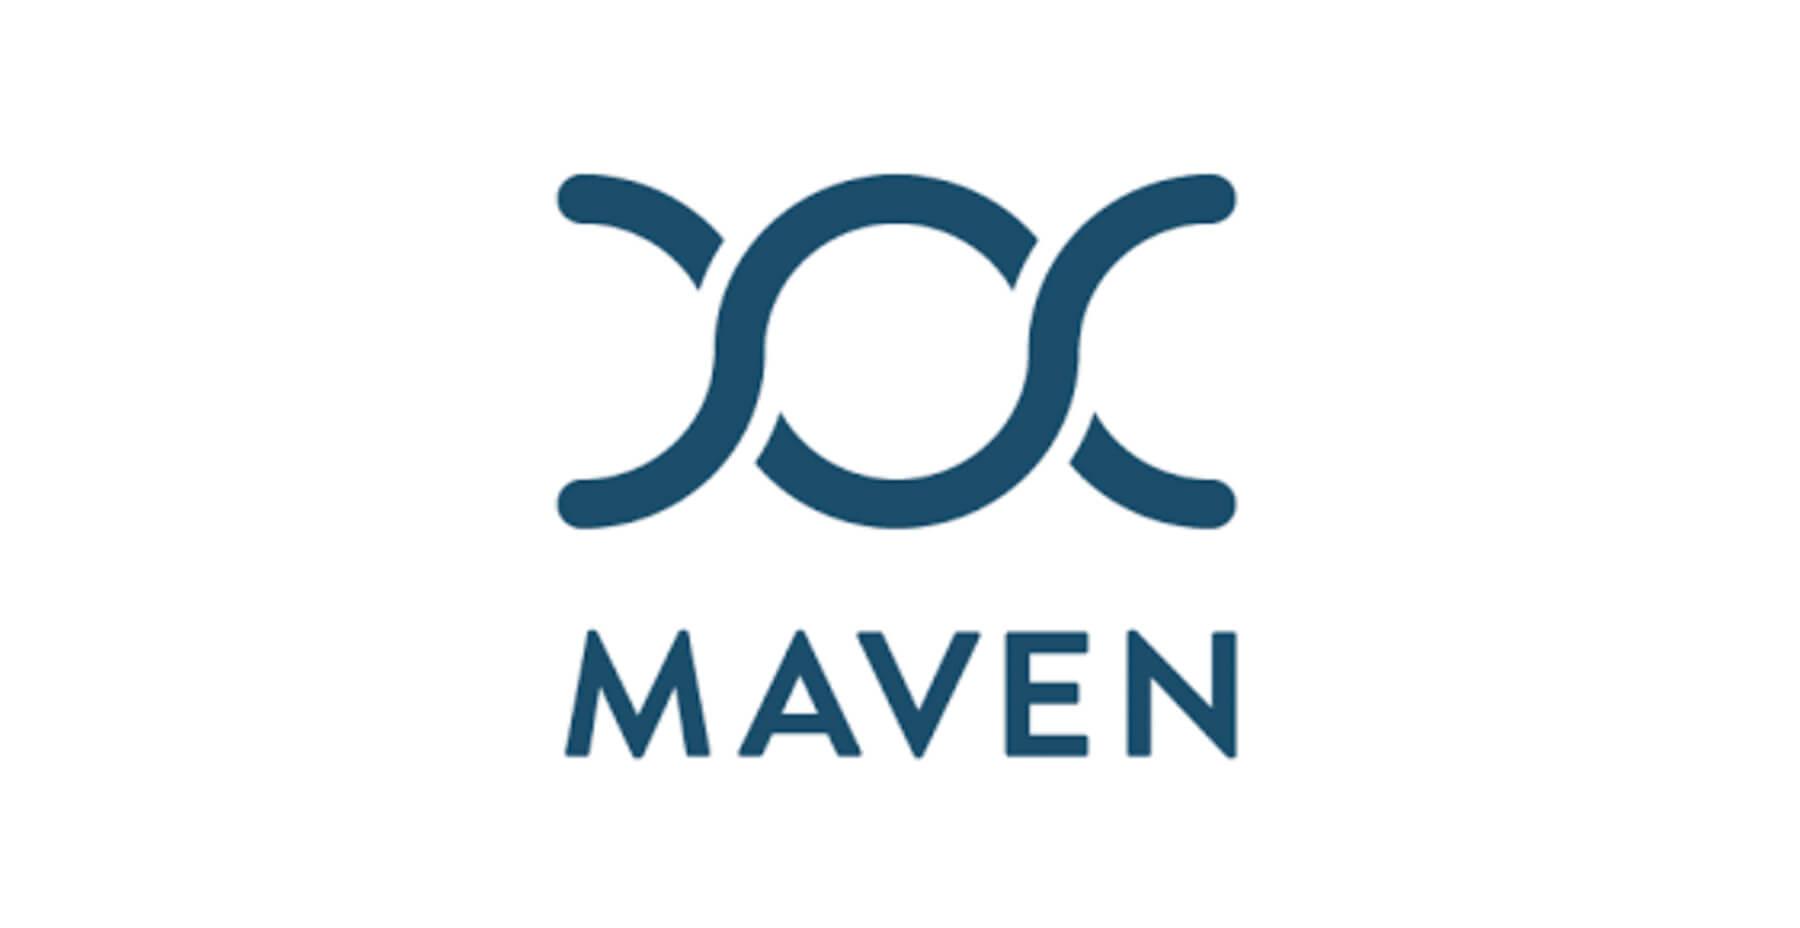 maven-1.jpg